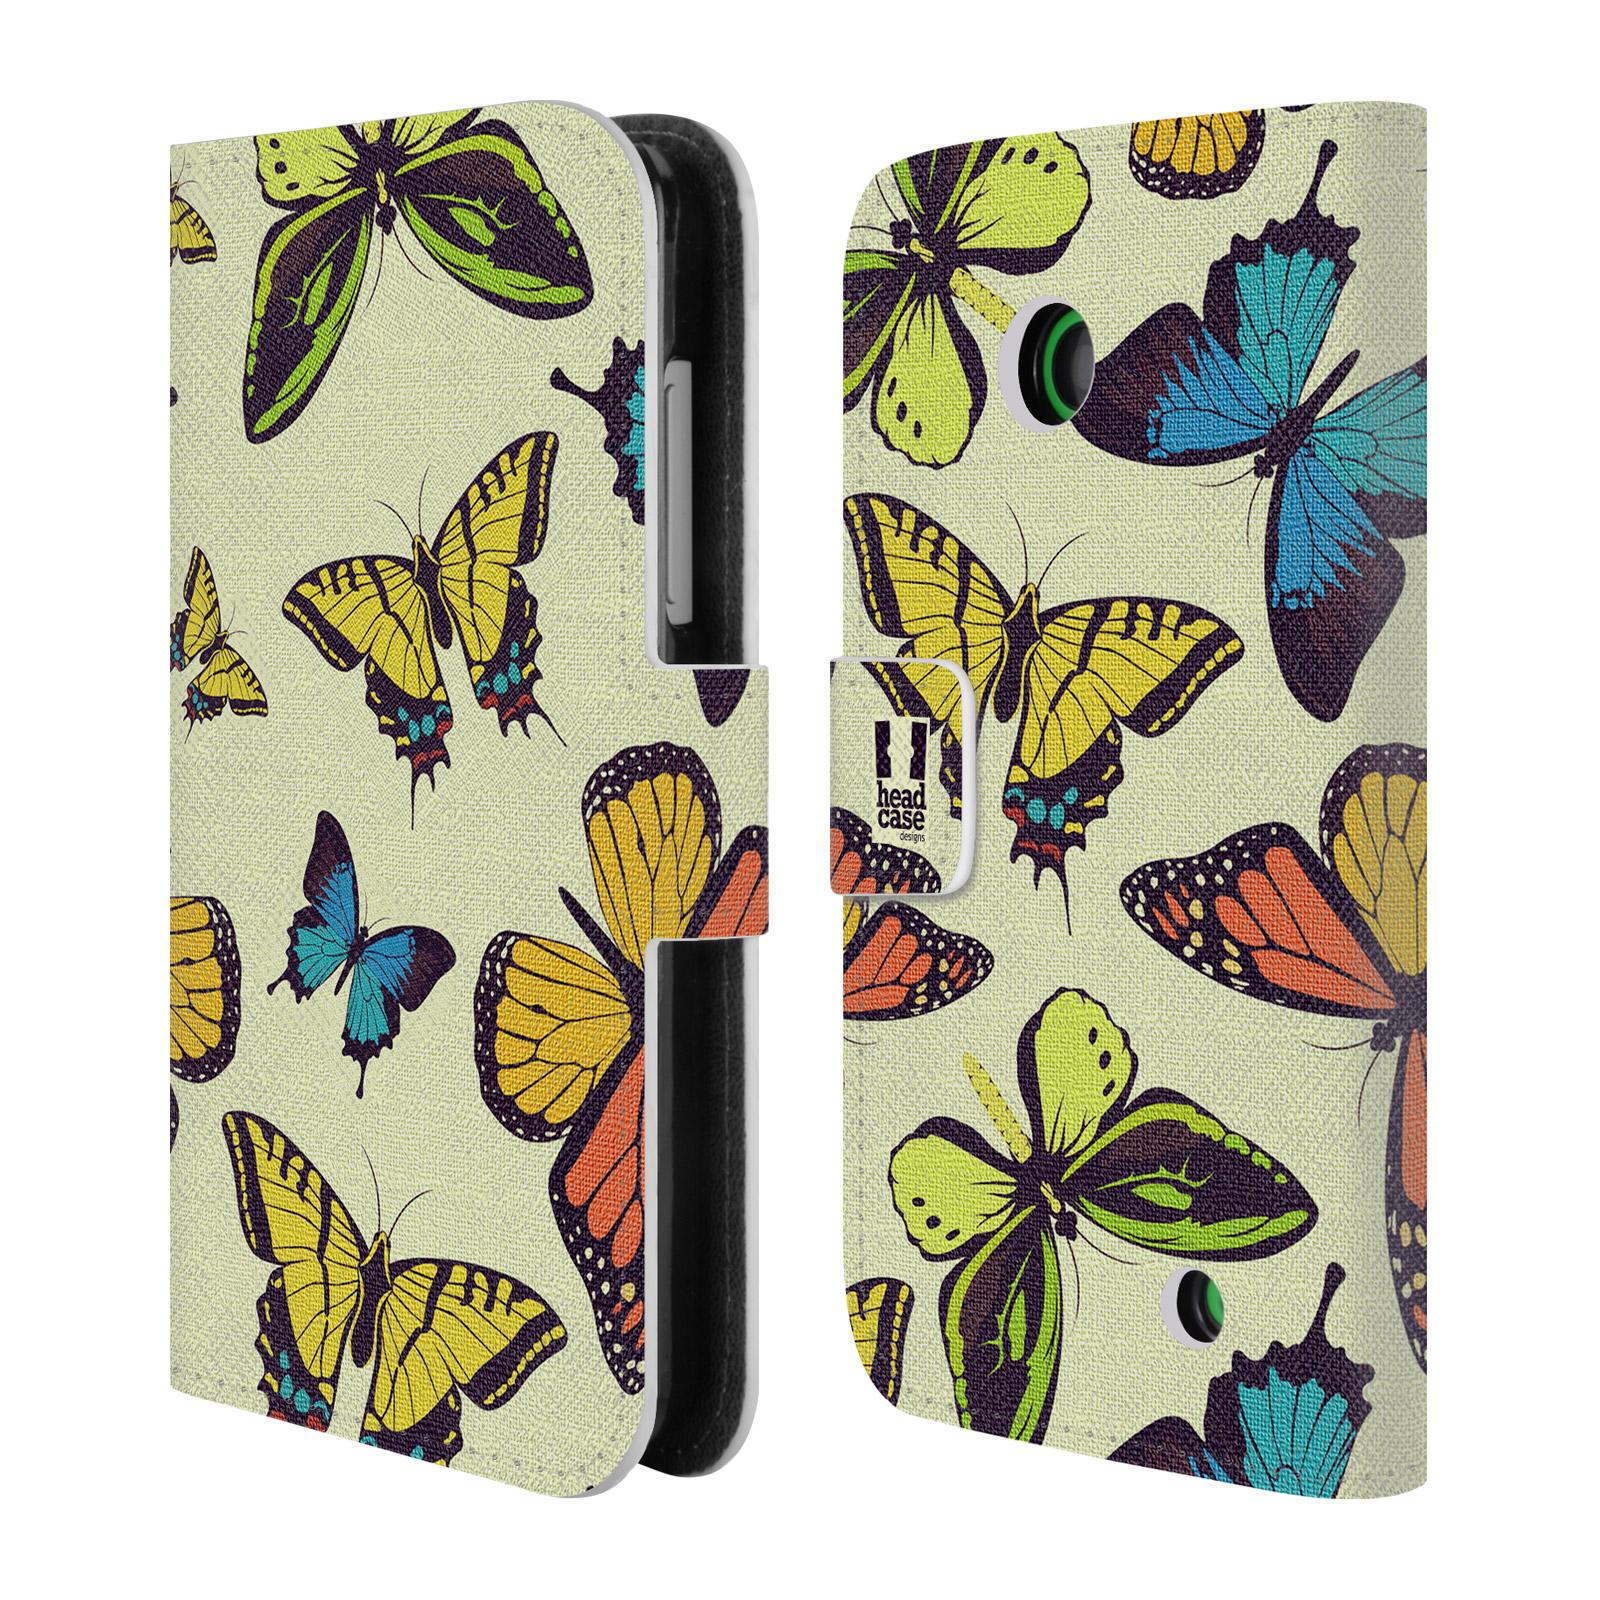 HEAD CASE Flipové pouzdro pro mobil NOKIA LUMIA 630 / LUMIA 630 DUAL Vzorkovaný motýl MIX